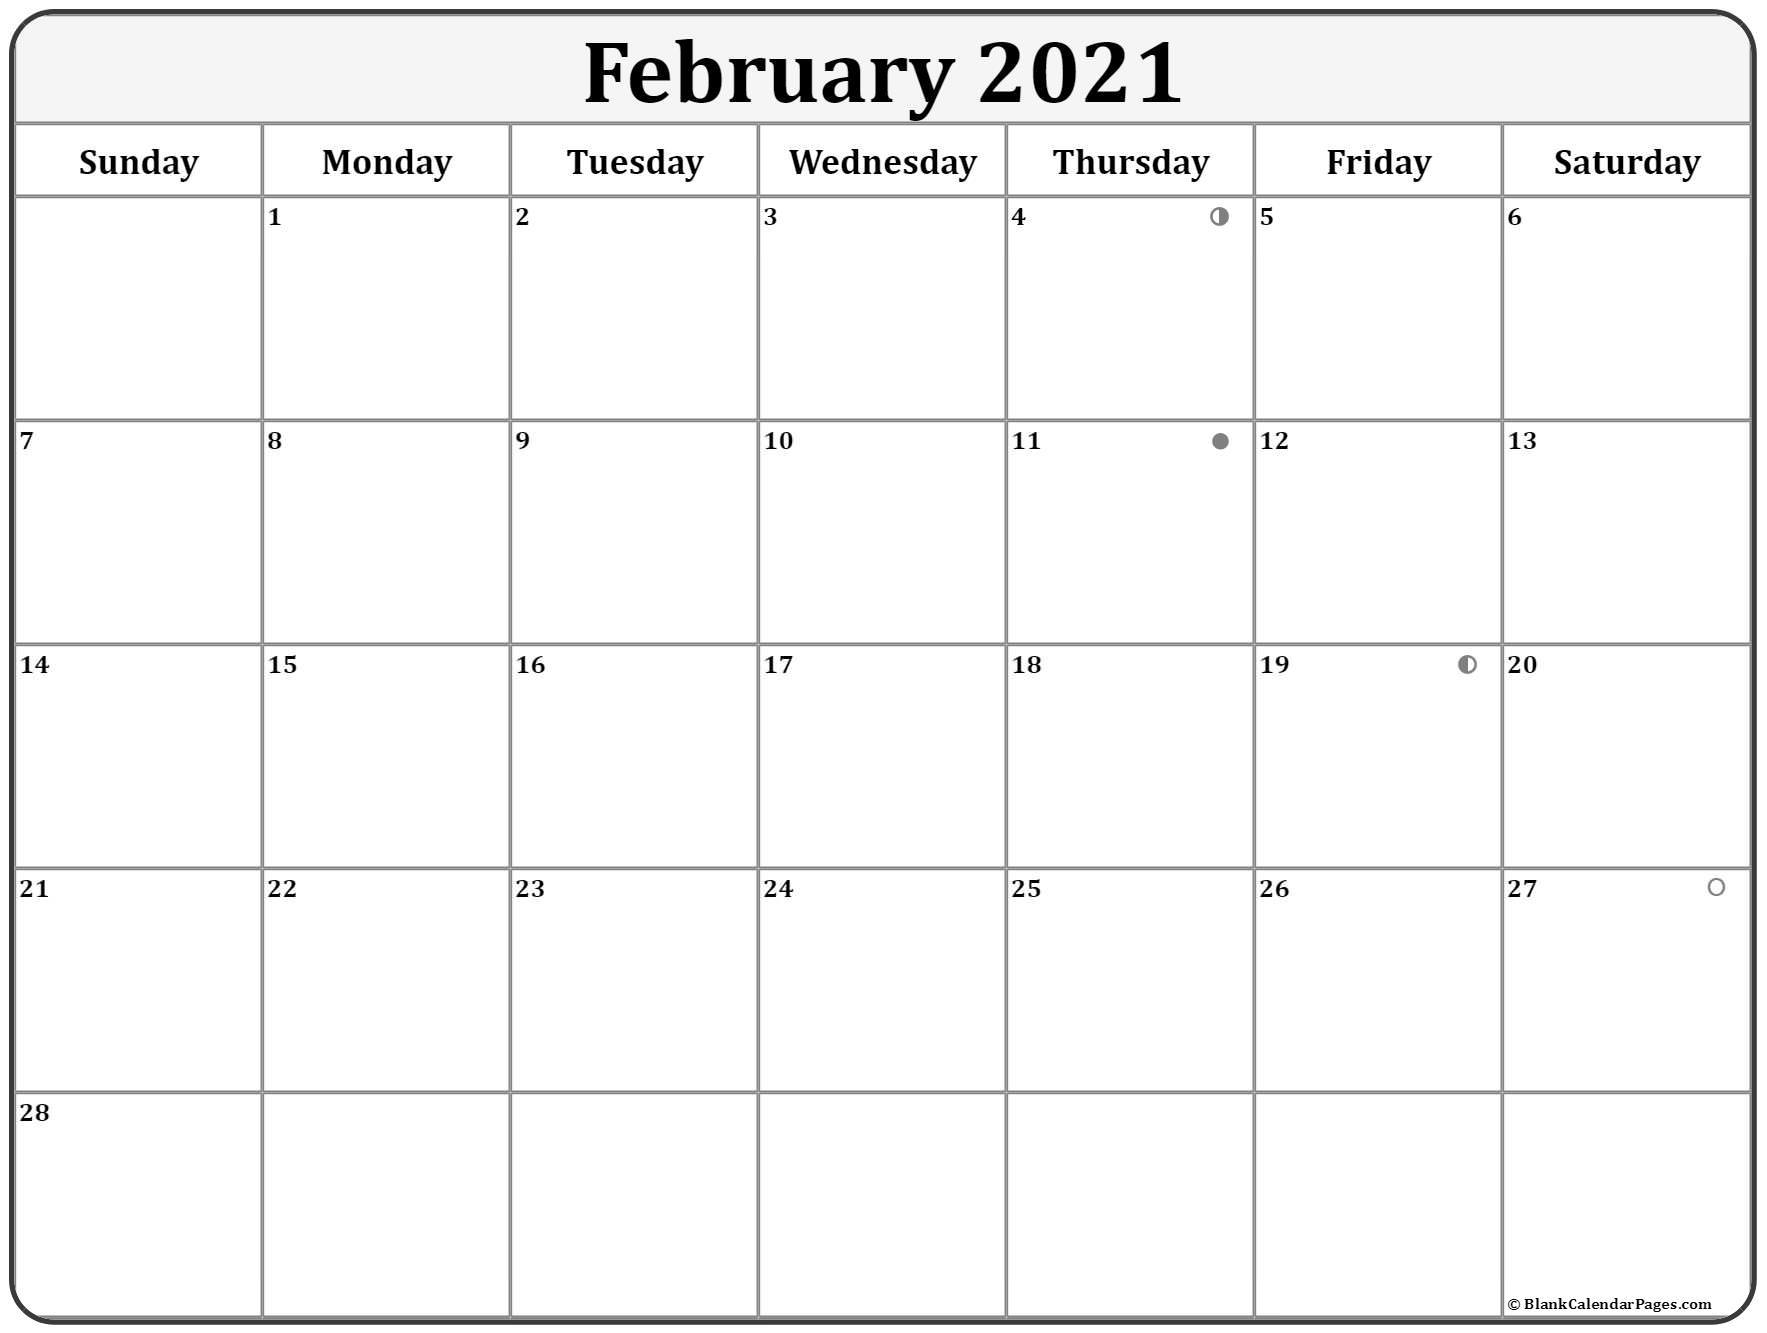 Feb 2021 Free Printable Calendar With Holidays And Moon